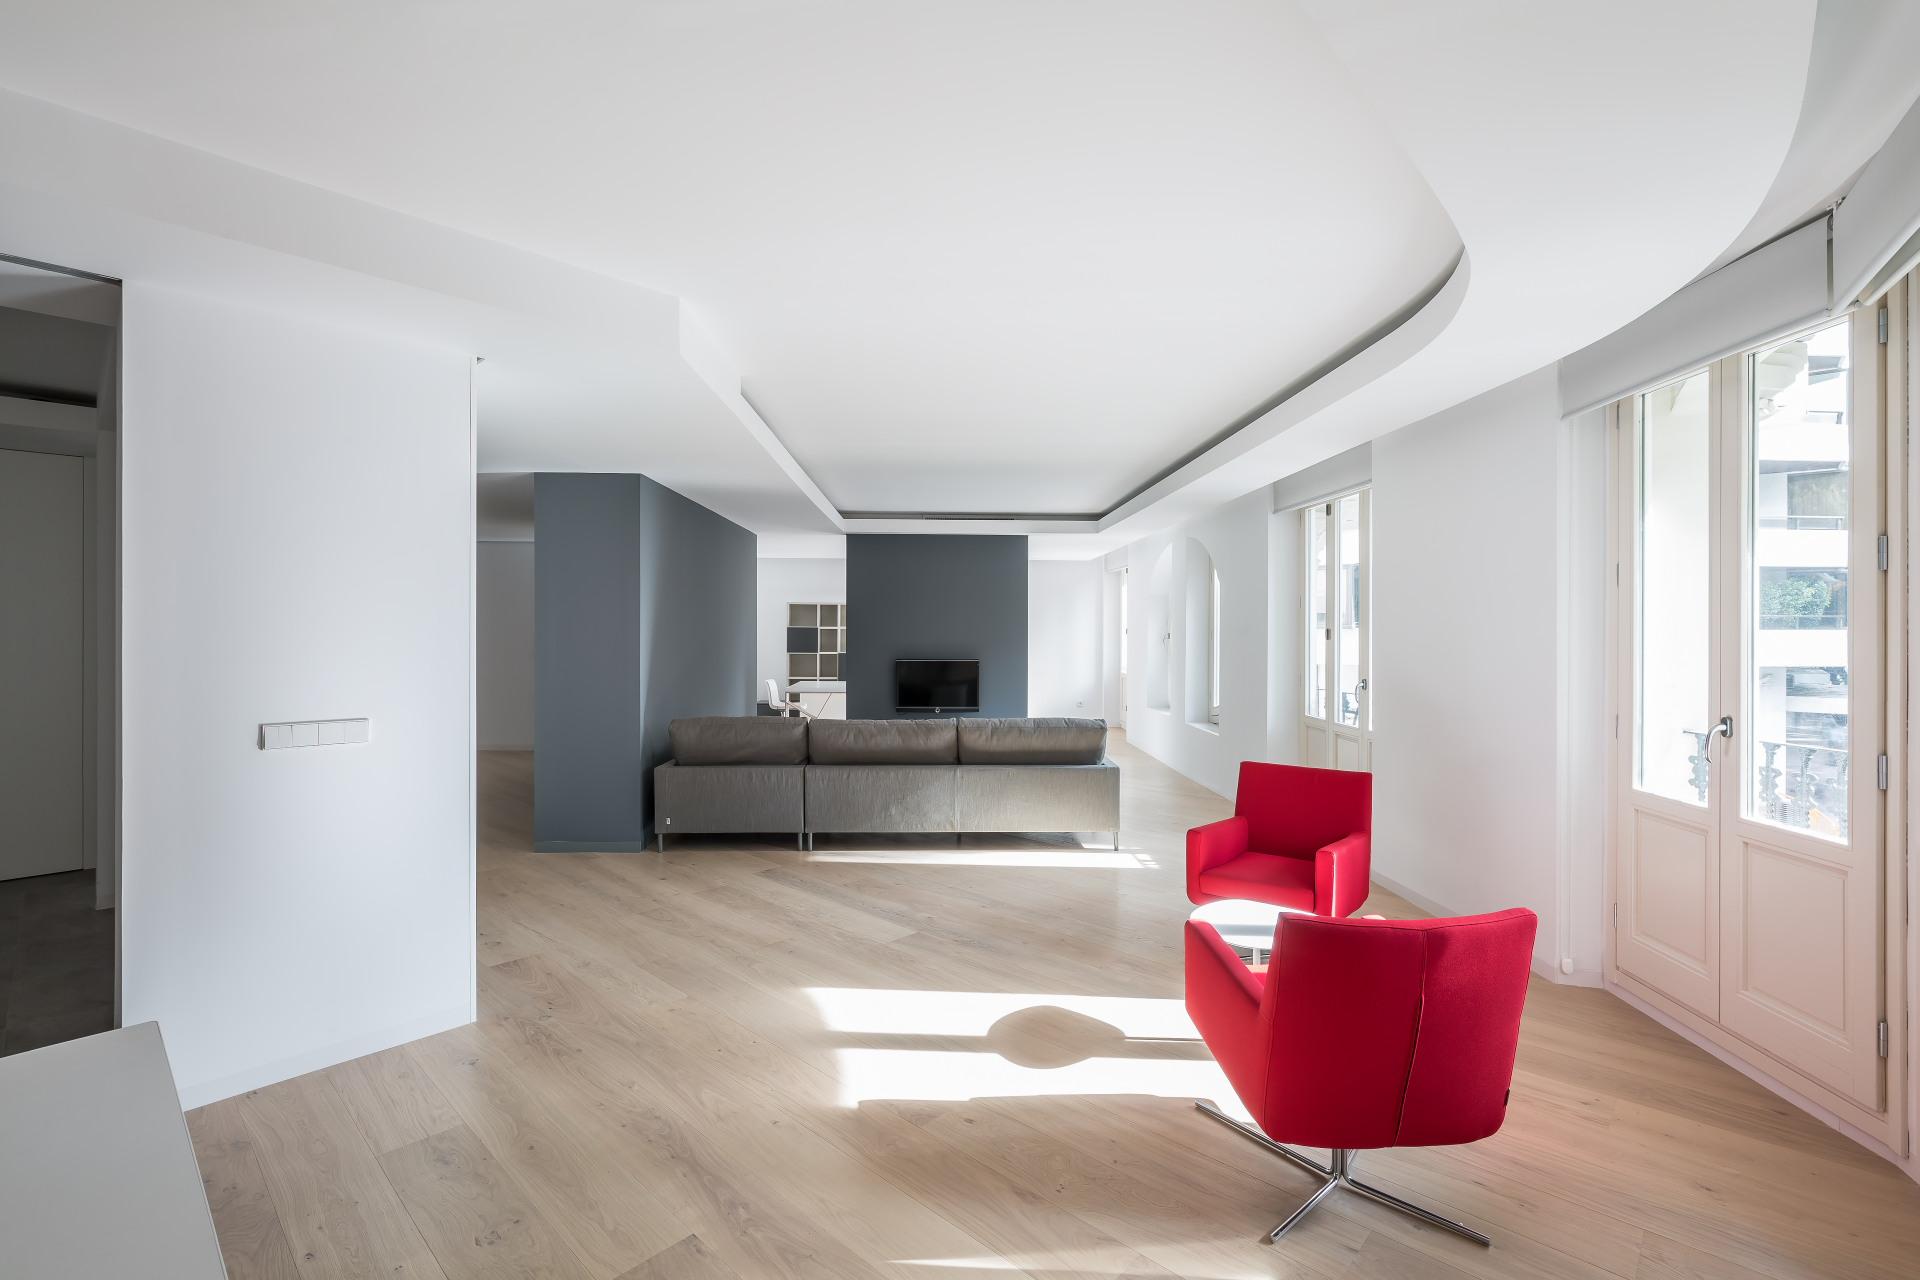 fotografia-arquitectura-interiorismo-valencia-german-cabo-gallardo-llopis-bfm-edificatoria-turia02 (7)